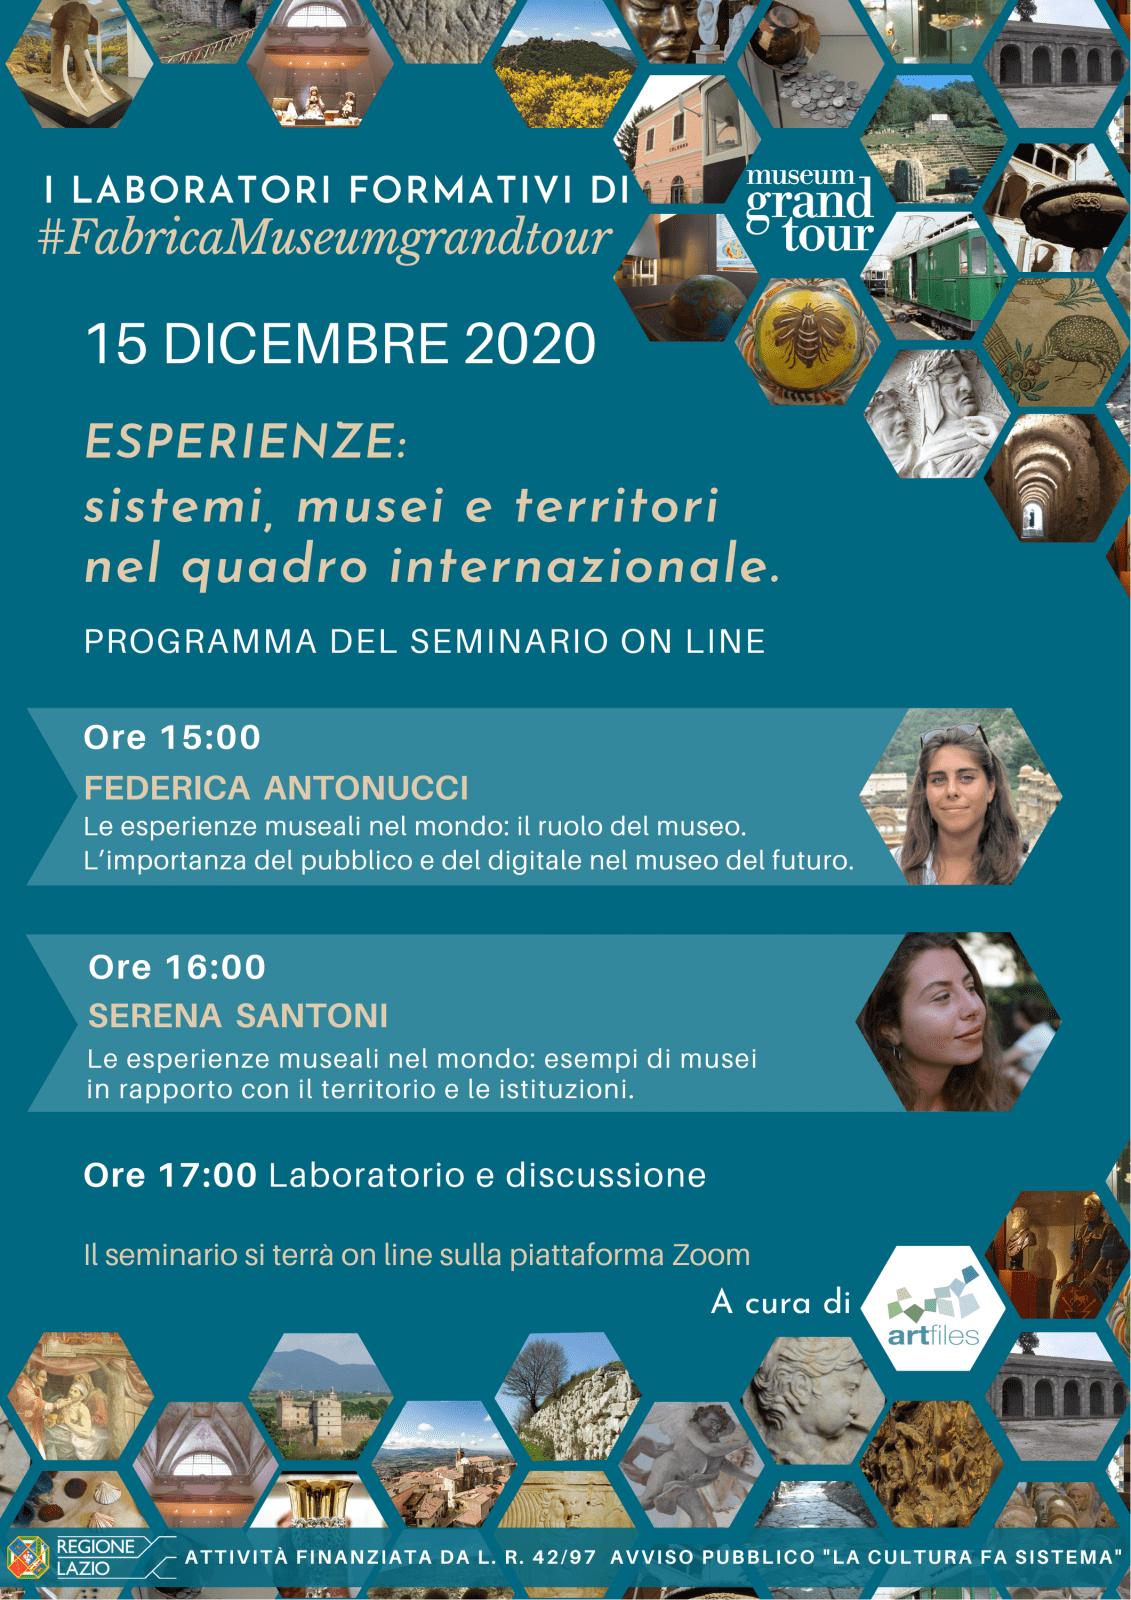 Seminario del 15 dicembre 2020